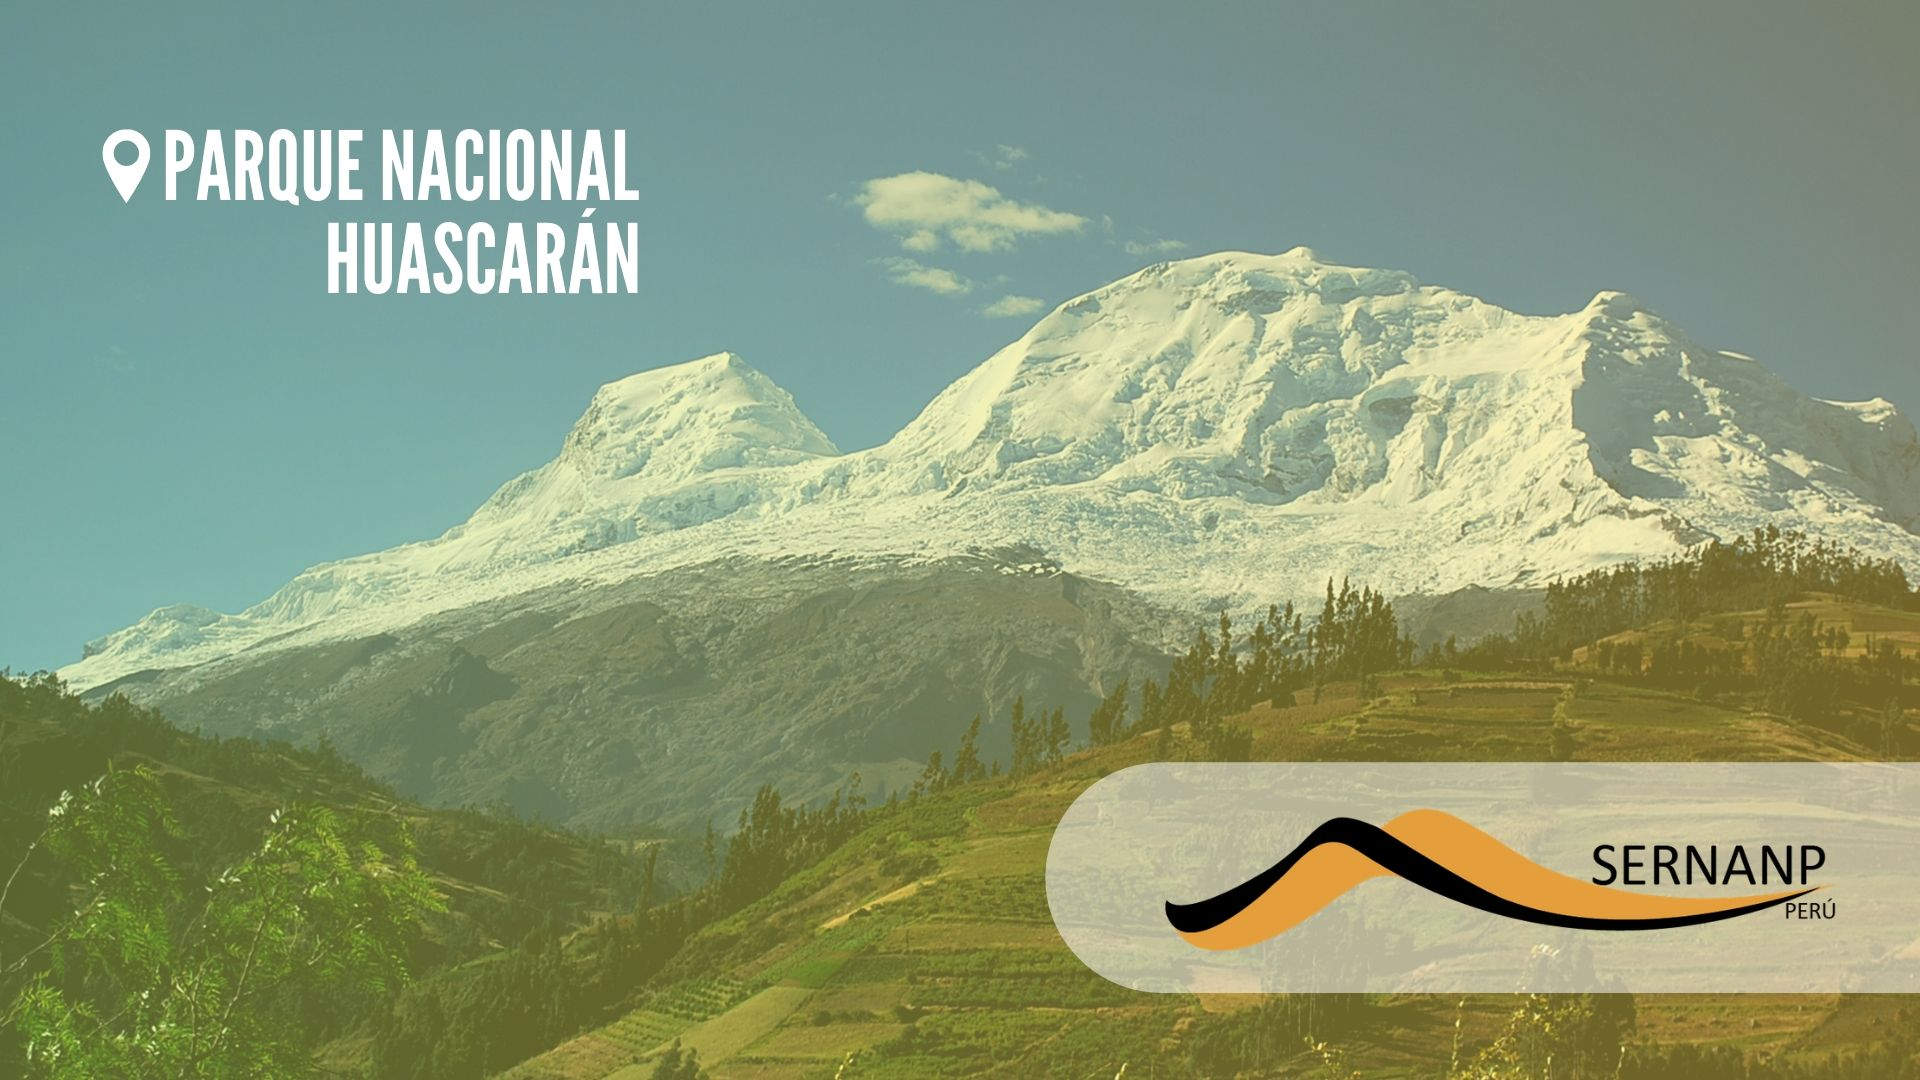 Parque Nacional Huascarán - SERNANP